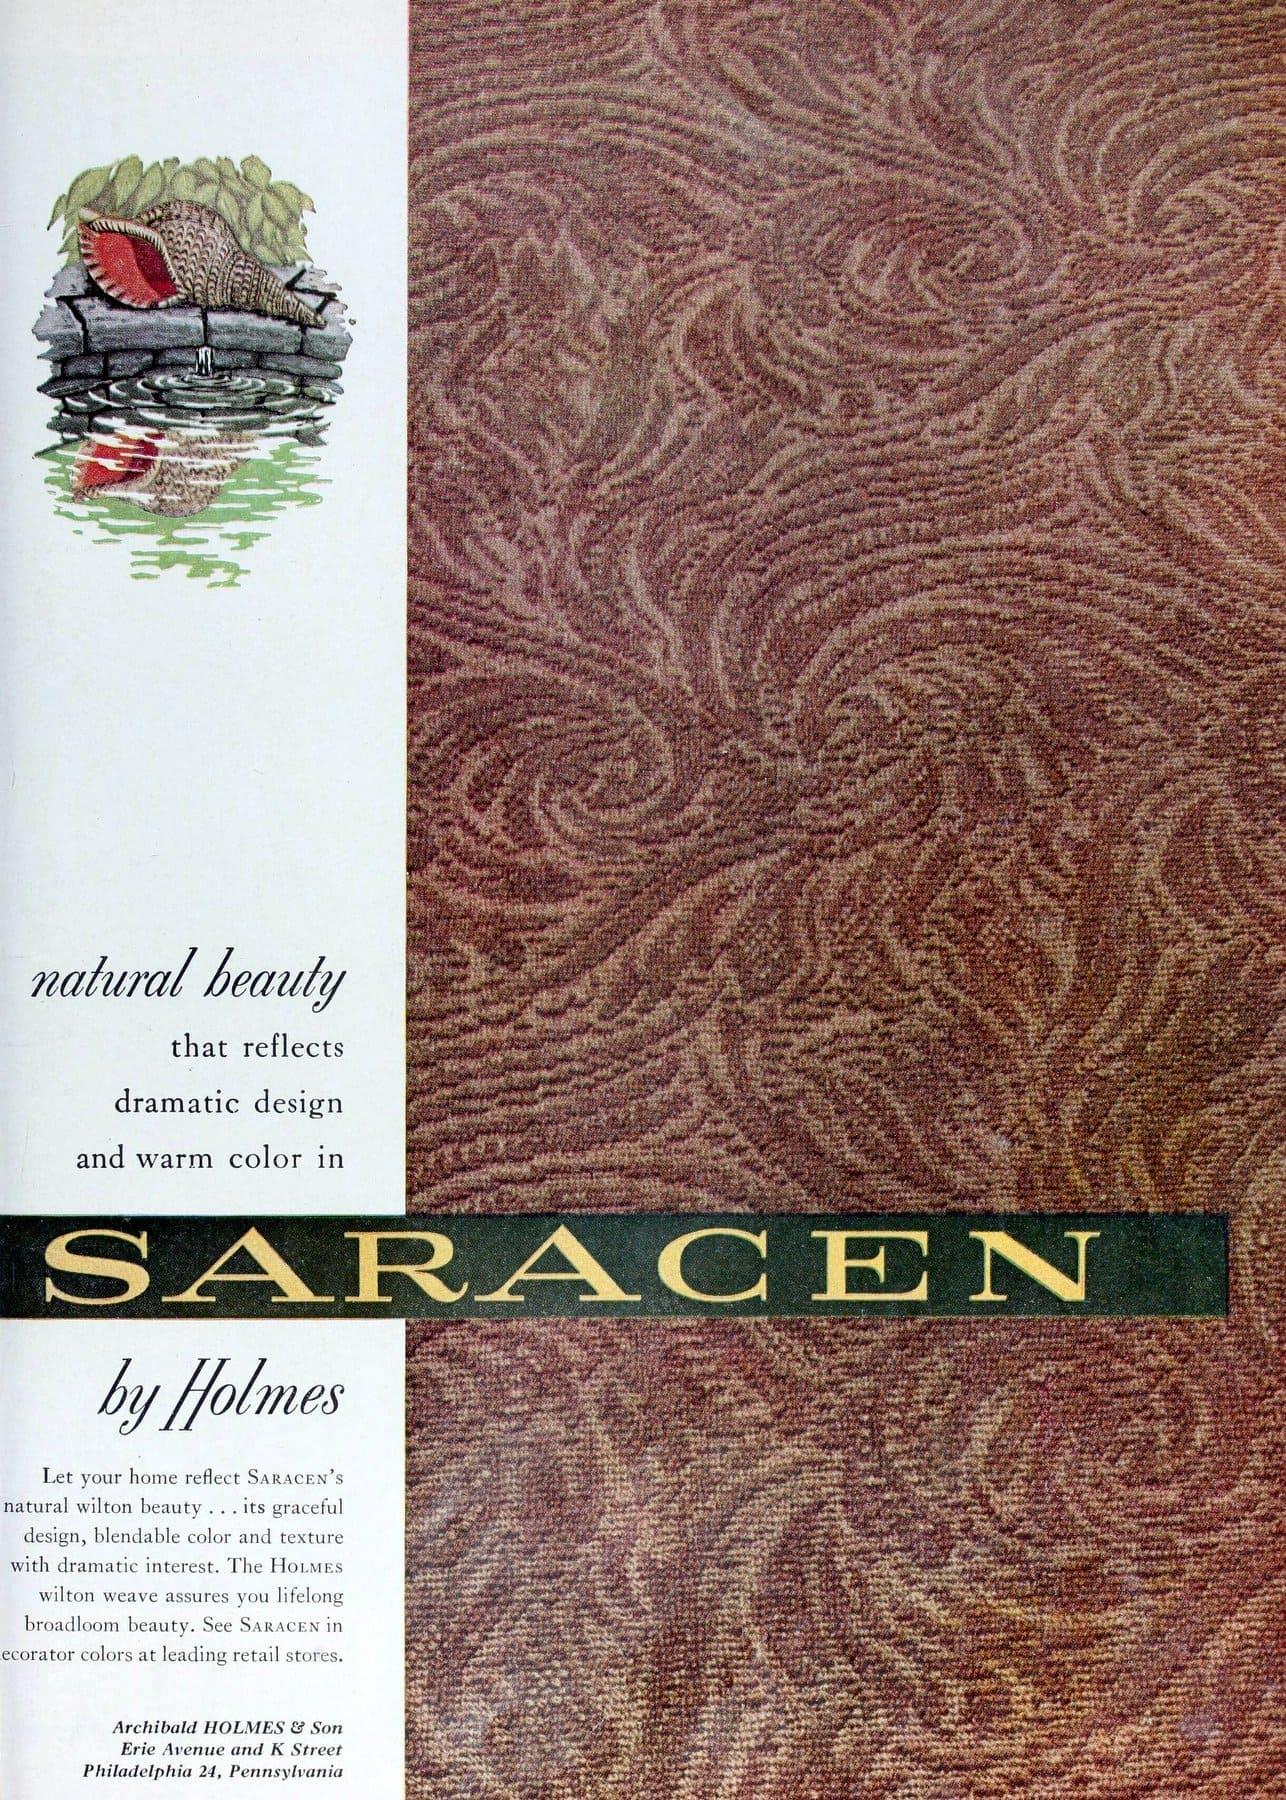 Dramatic vintage Saracen by Holmes textured carpet (1954)